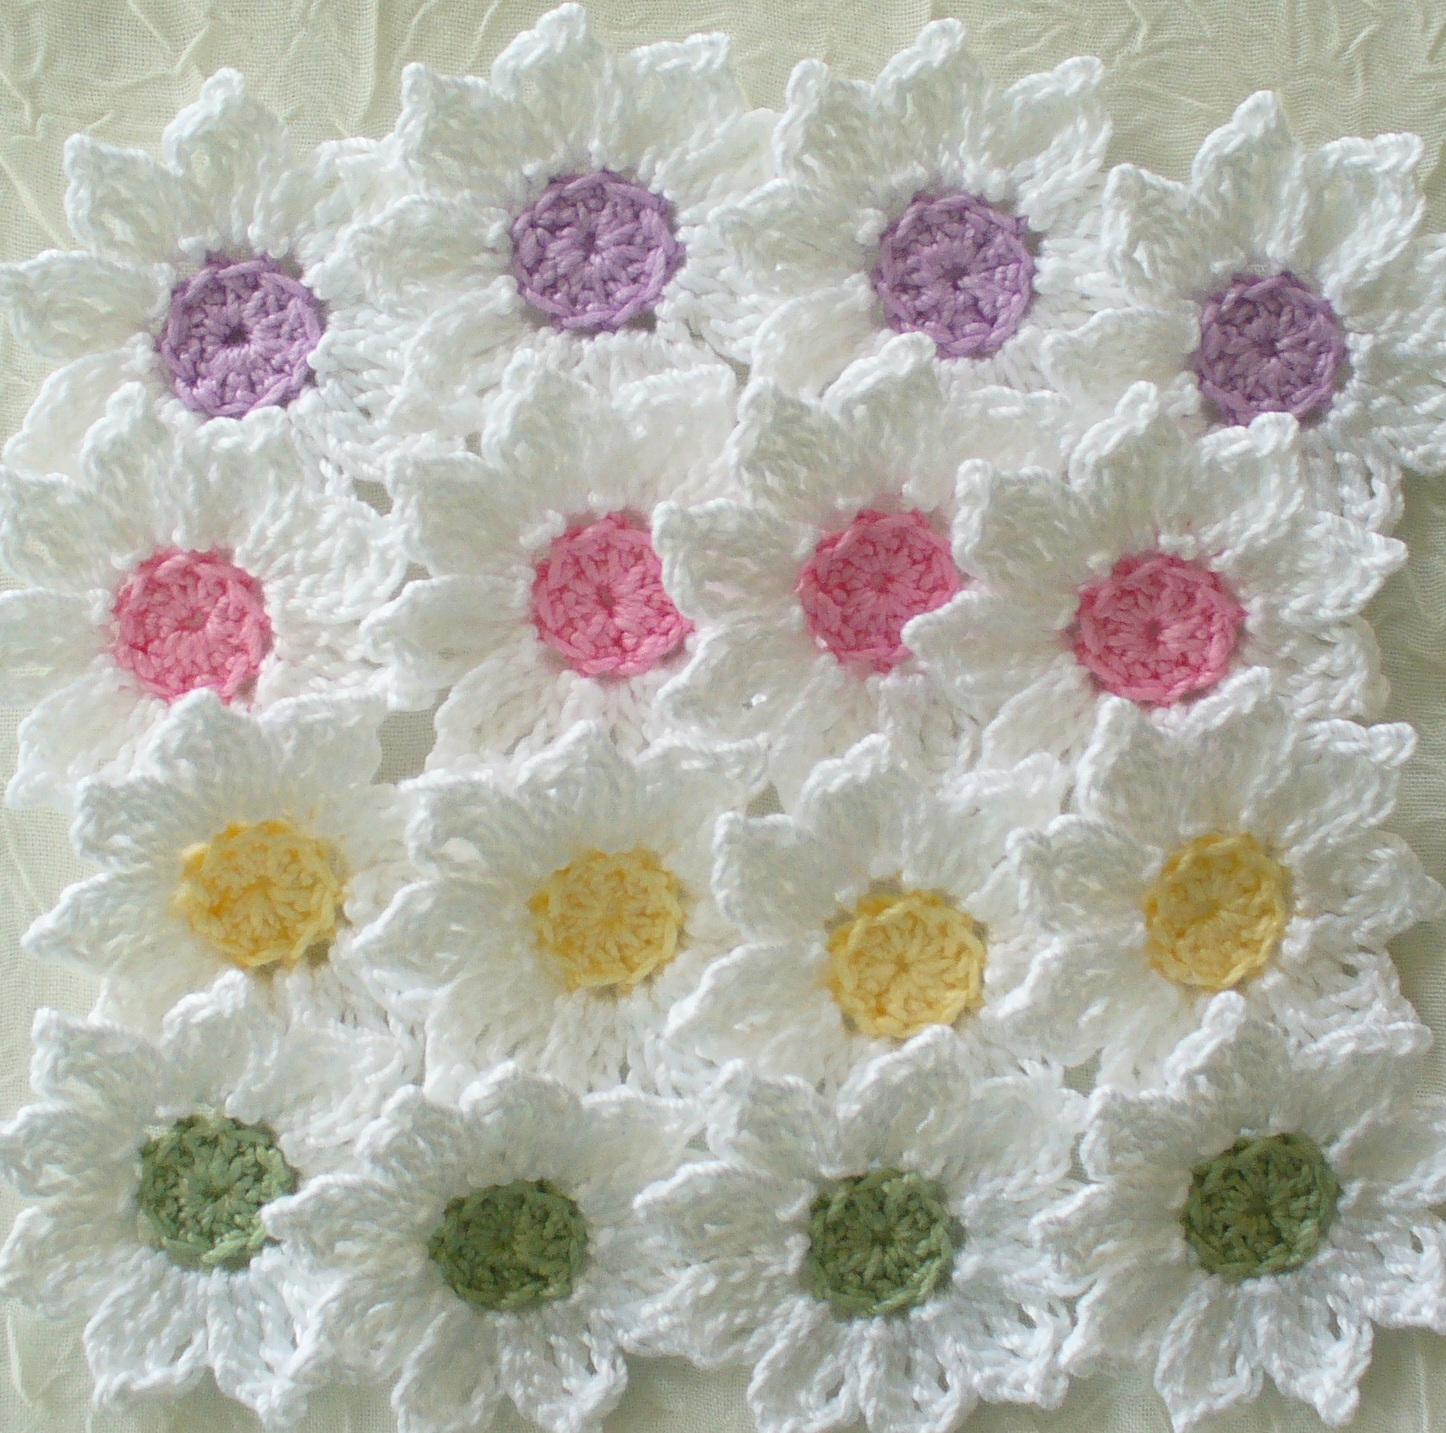 Crochet Small Daisy Flower Pattern : Fresh As A Daisy - Crochet Flowers, Appliques - Set Of 16 ...